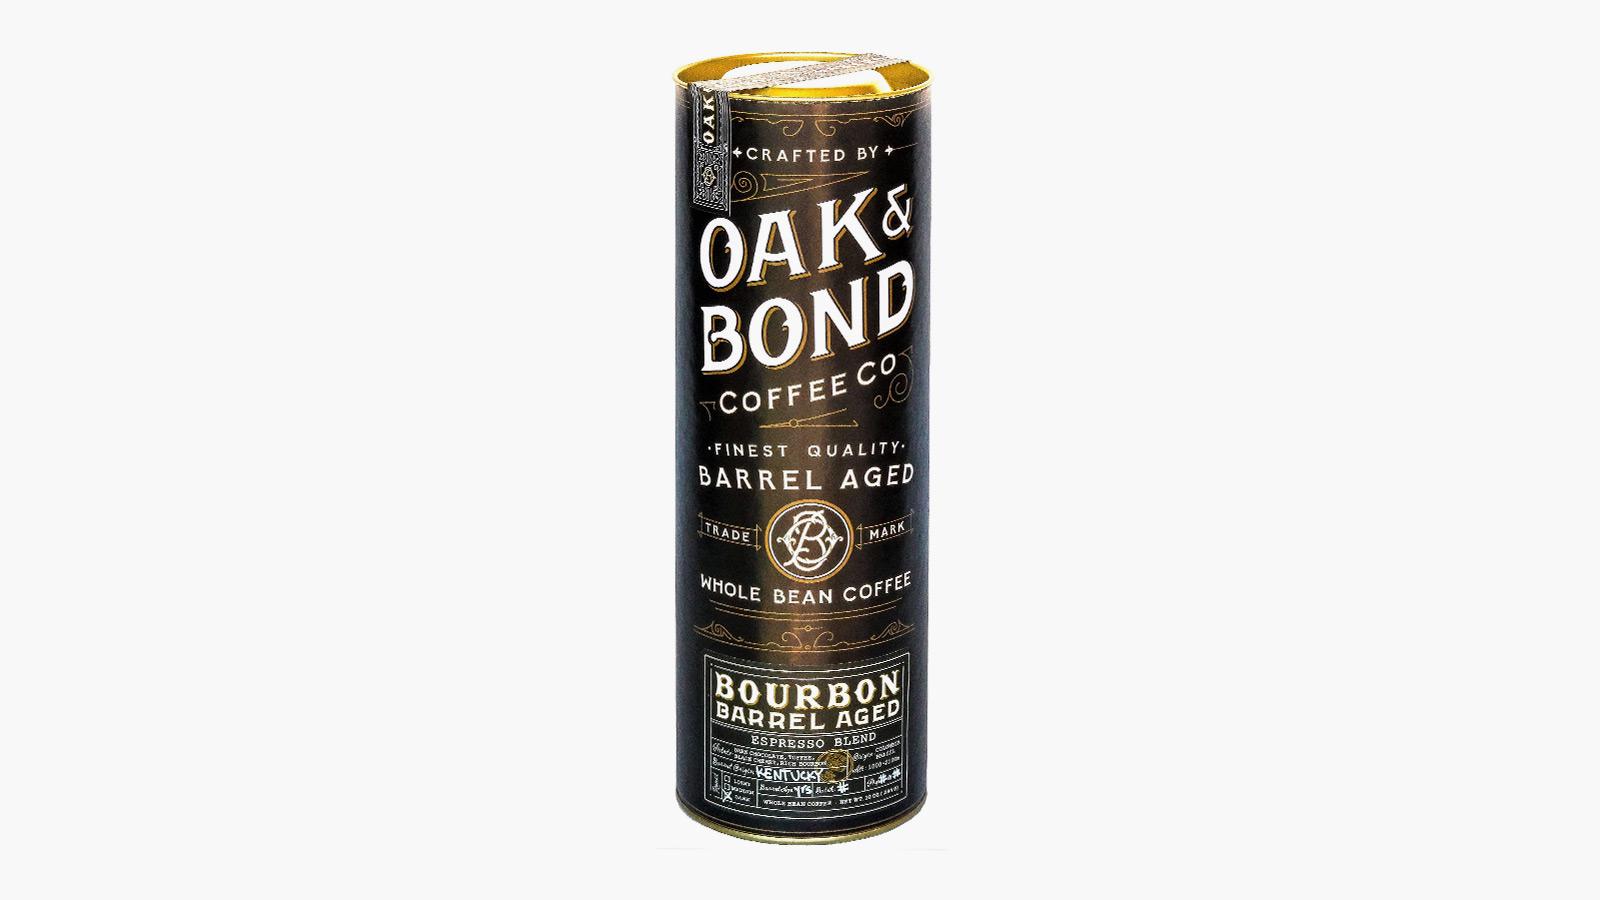 Oak & Bond Espresso Bourbon Barrel Aged Coffee